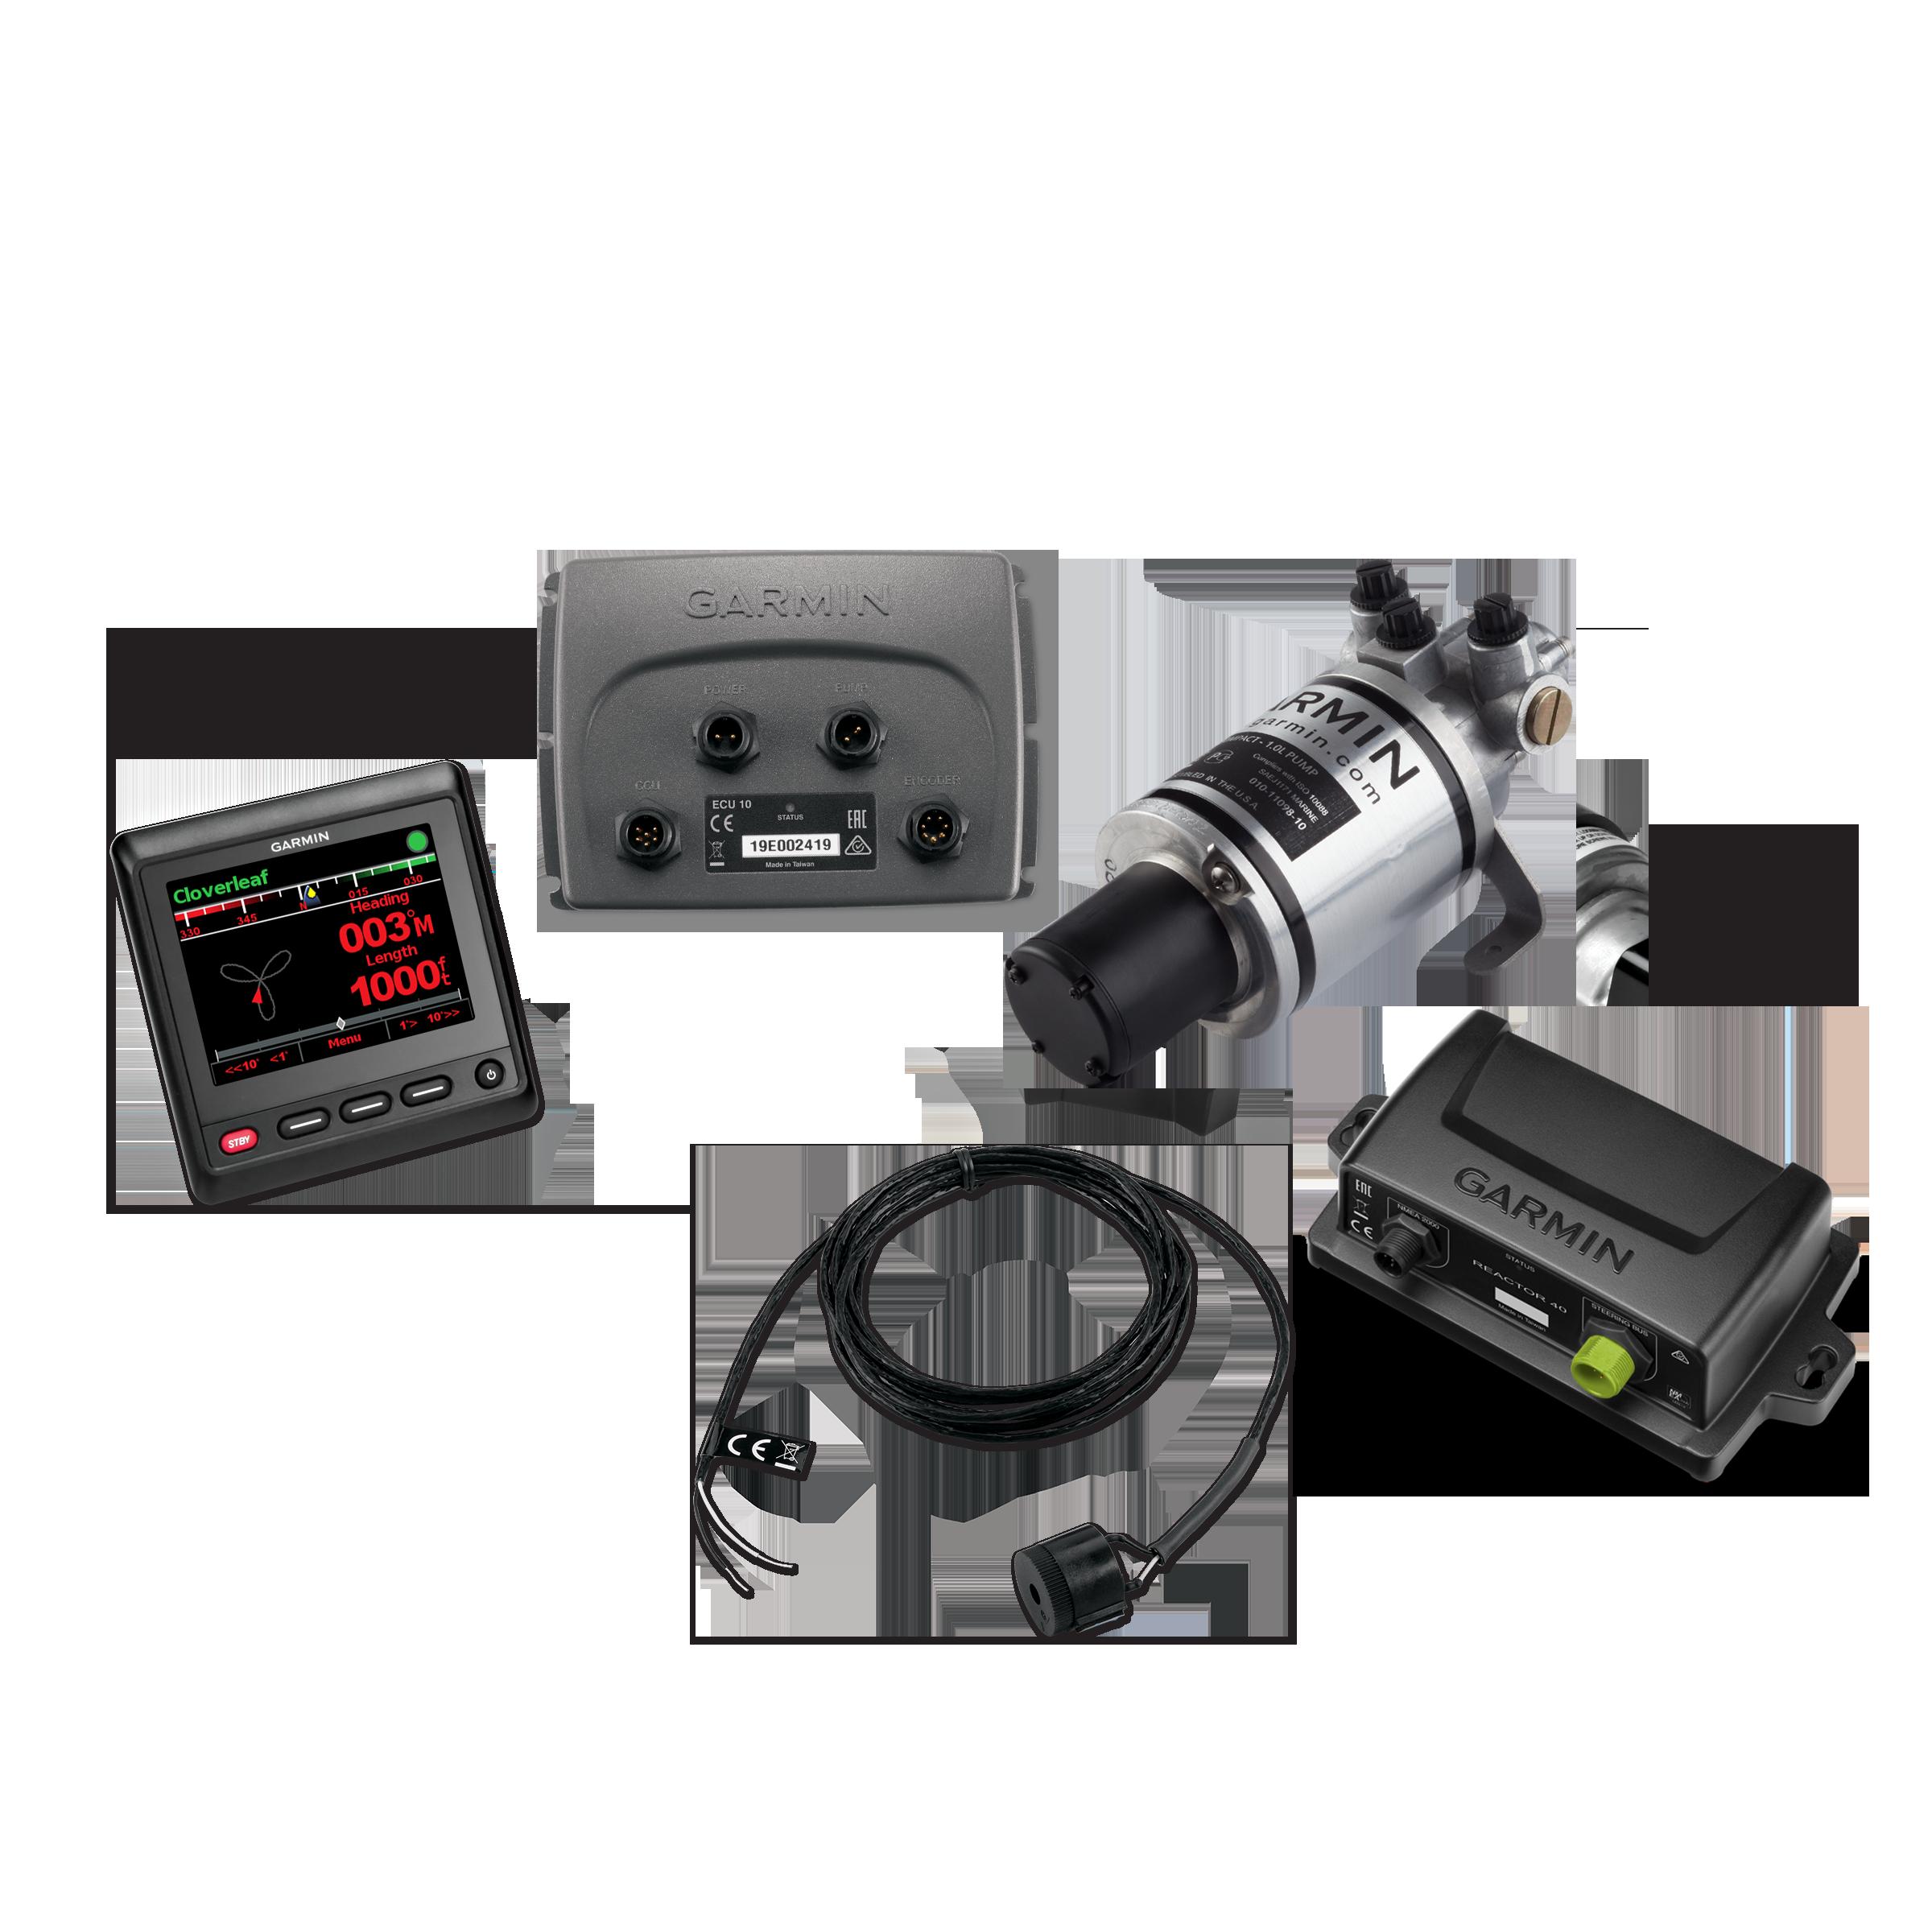 garmin compact reactor 40 hydraulic autopilot ghc 20 corepack